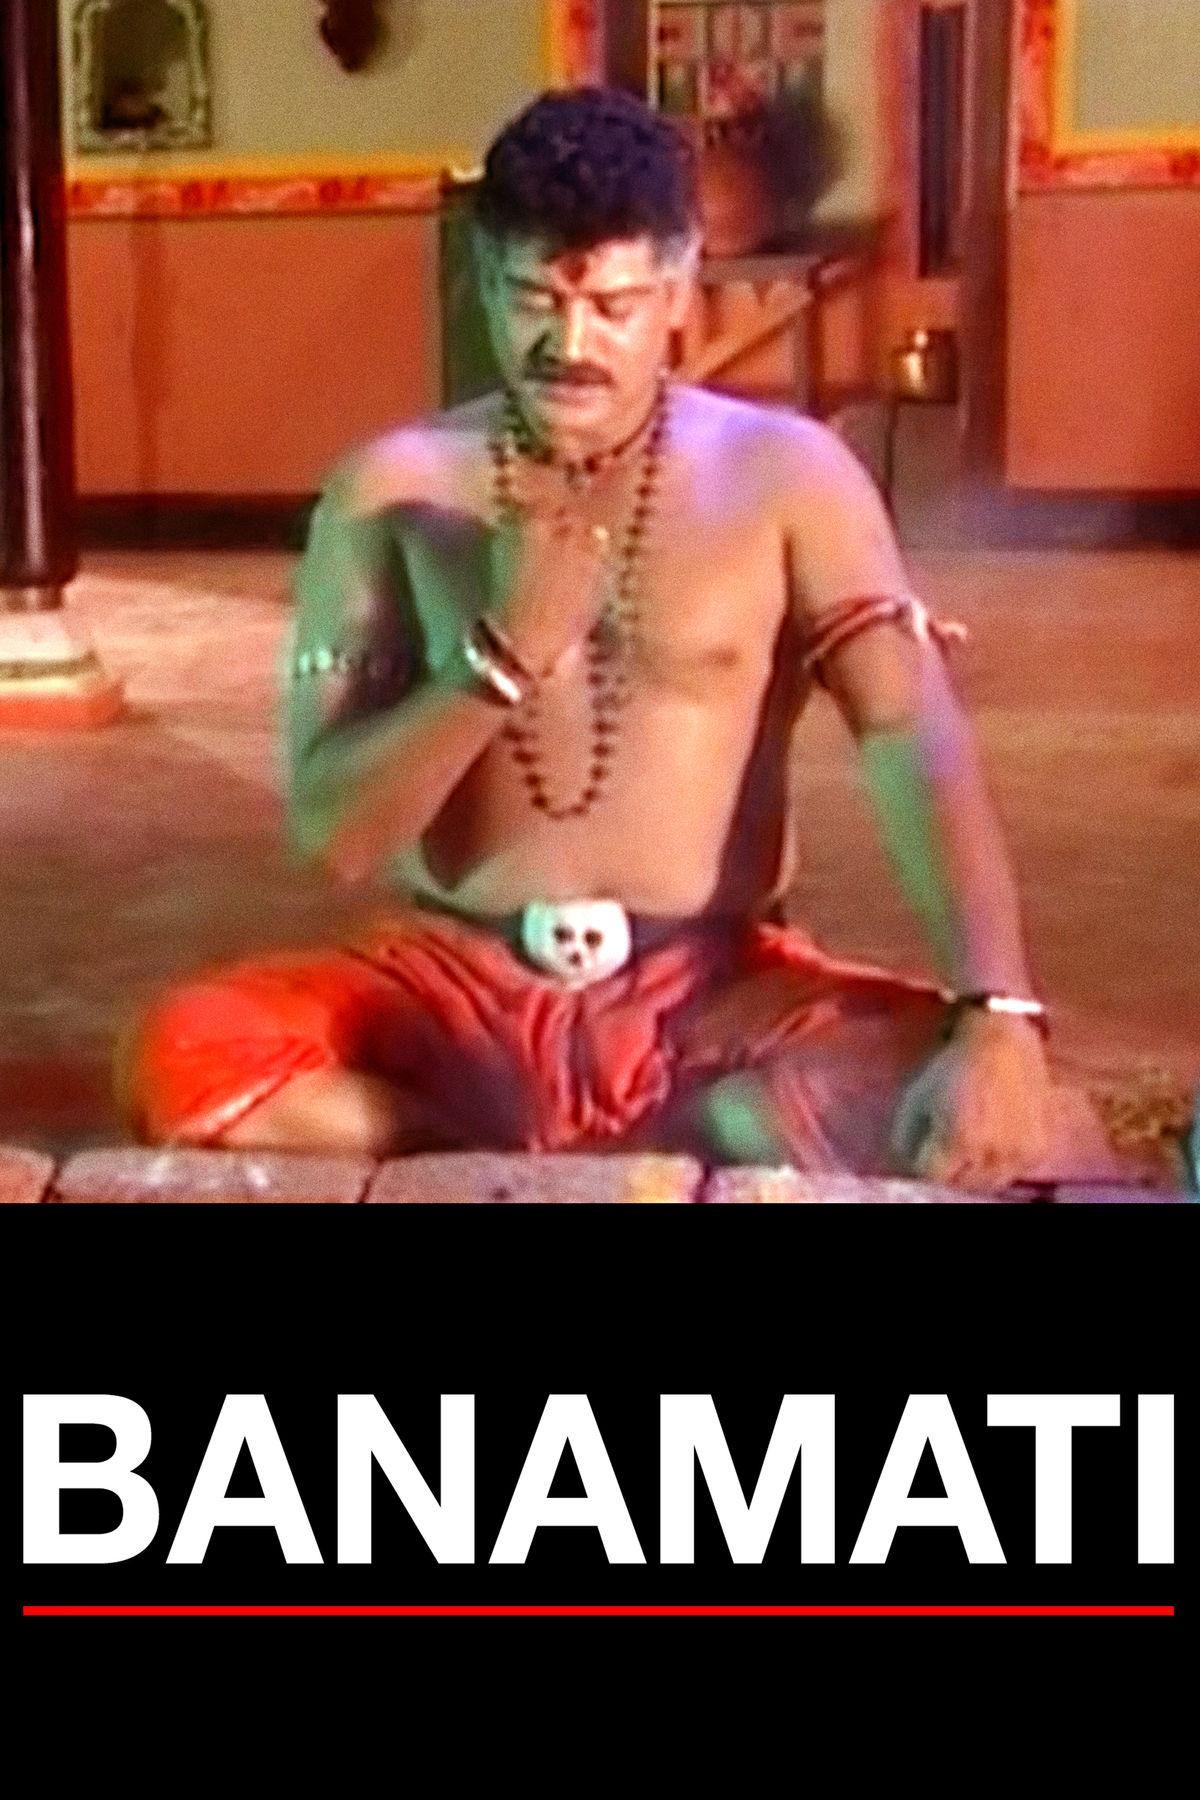 Banamati